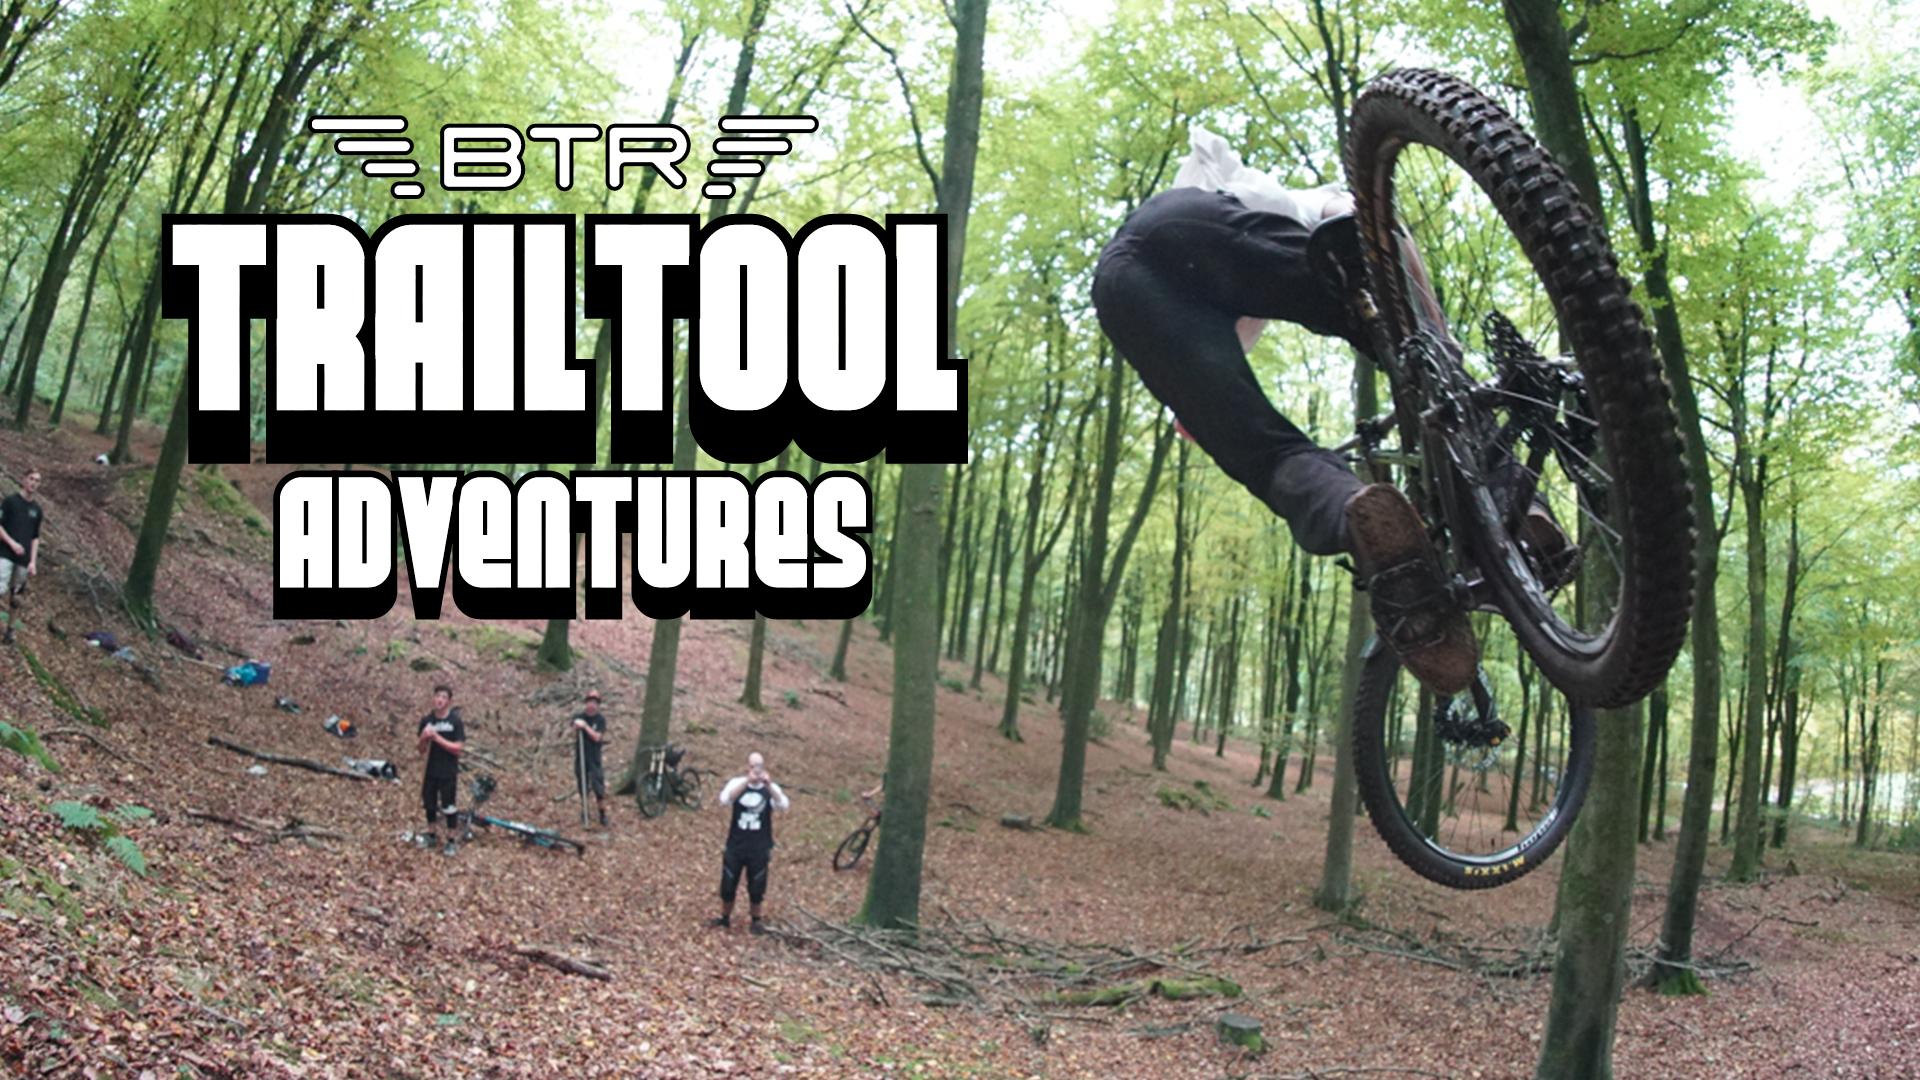 Trail Tool Adventures - BTR